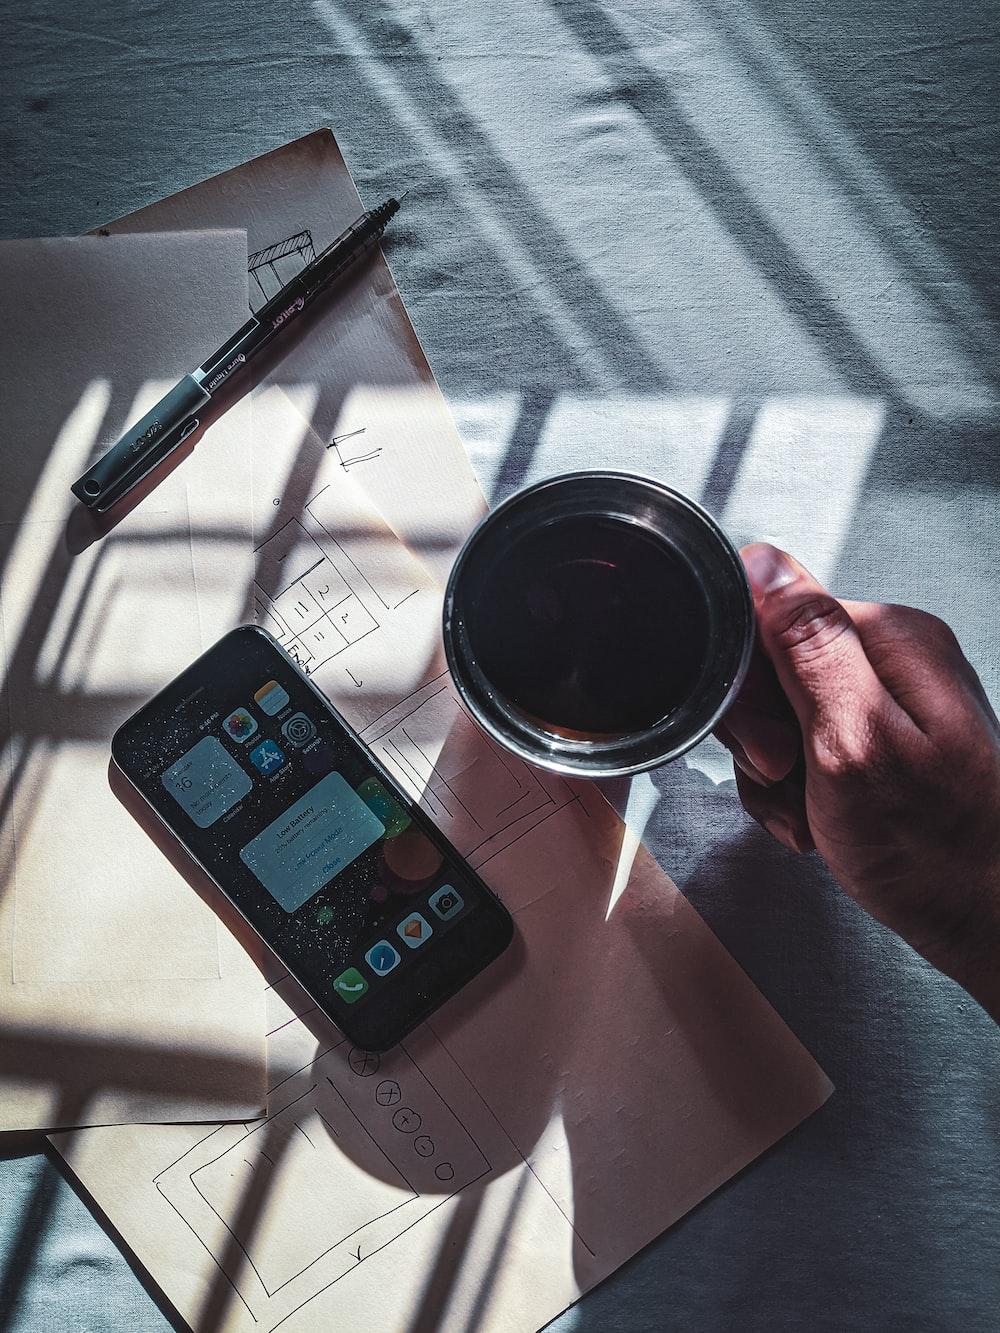 black iphone 4 beside black pen